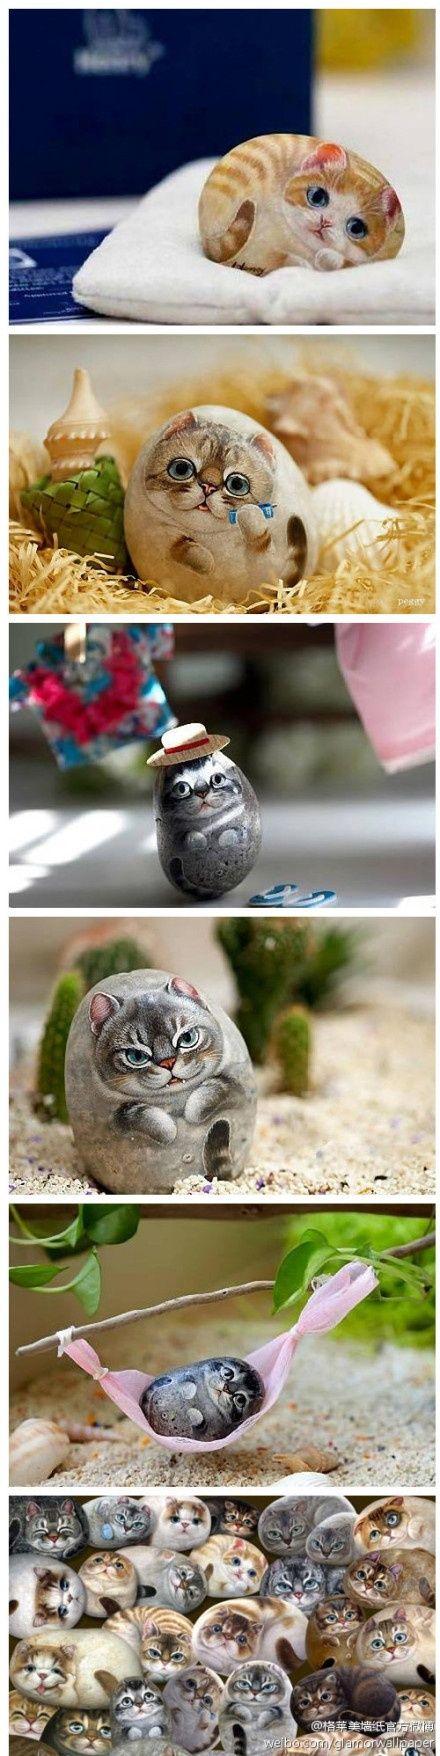 Very Cute Rock Kitties   Painted Rocks   Cats